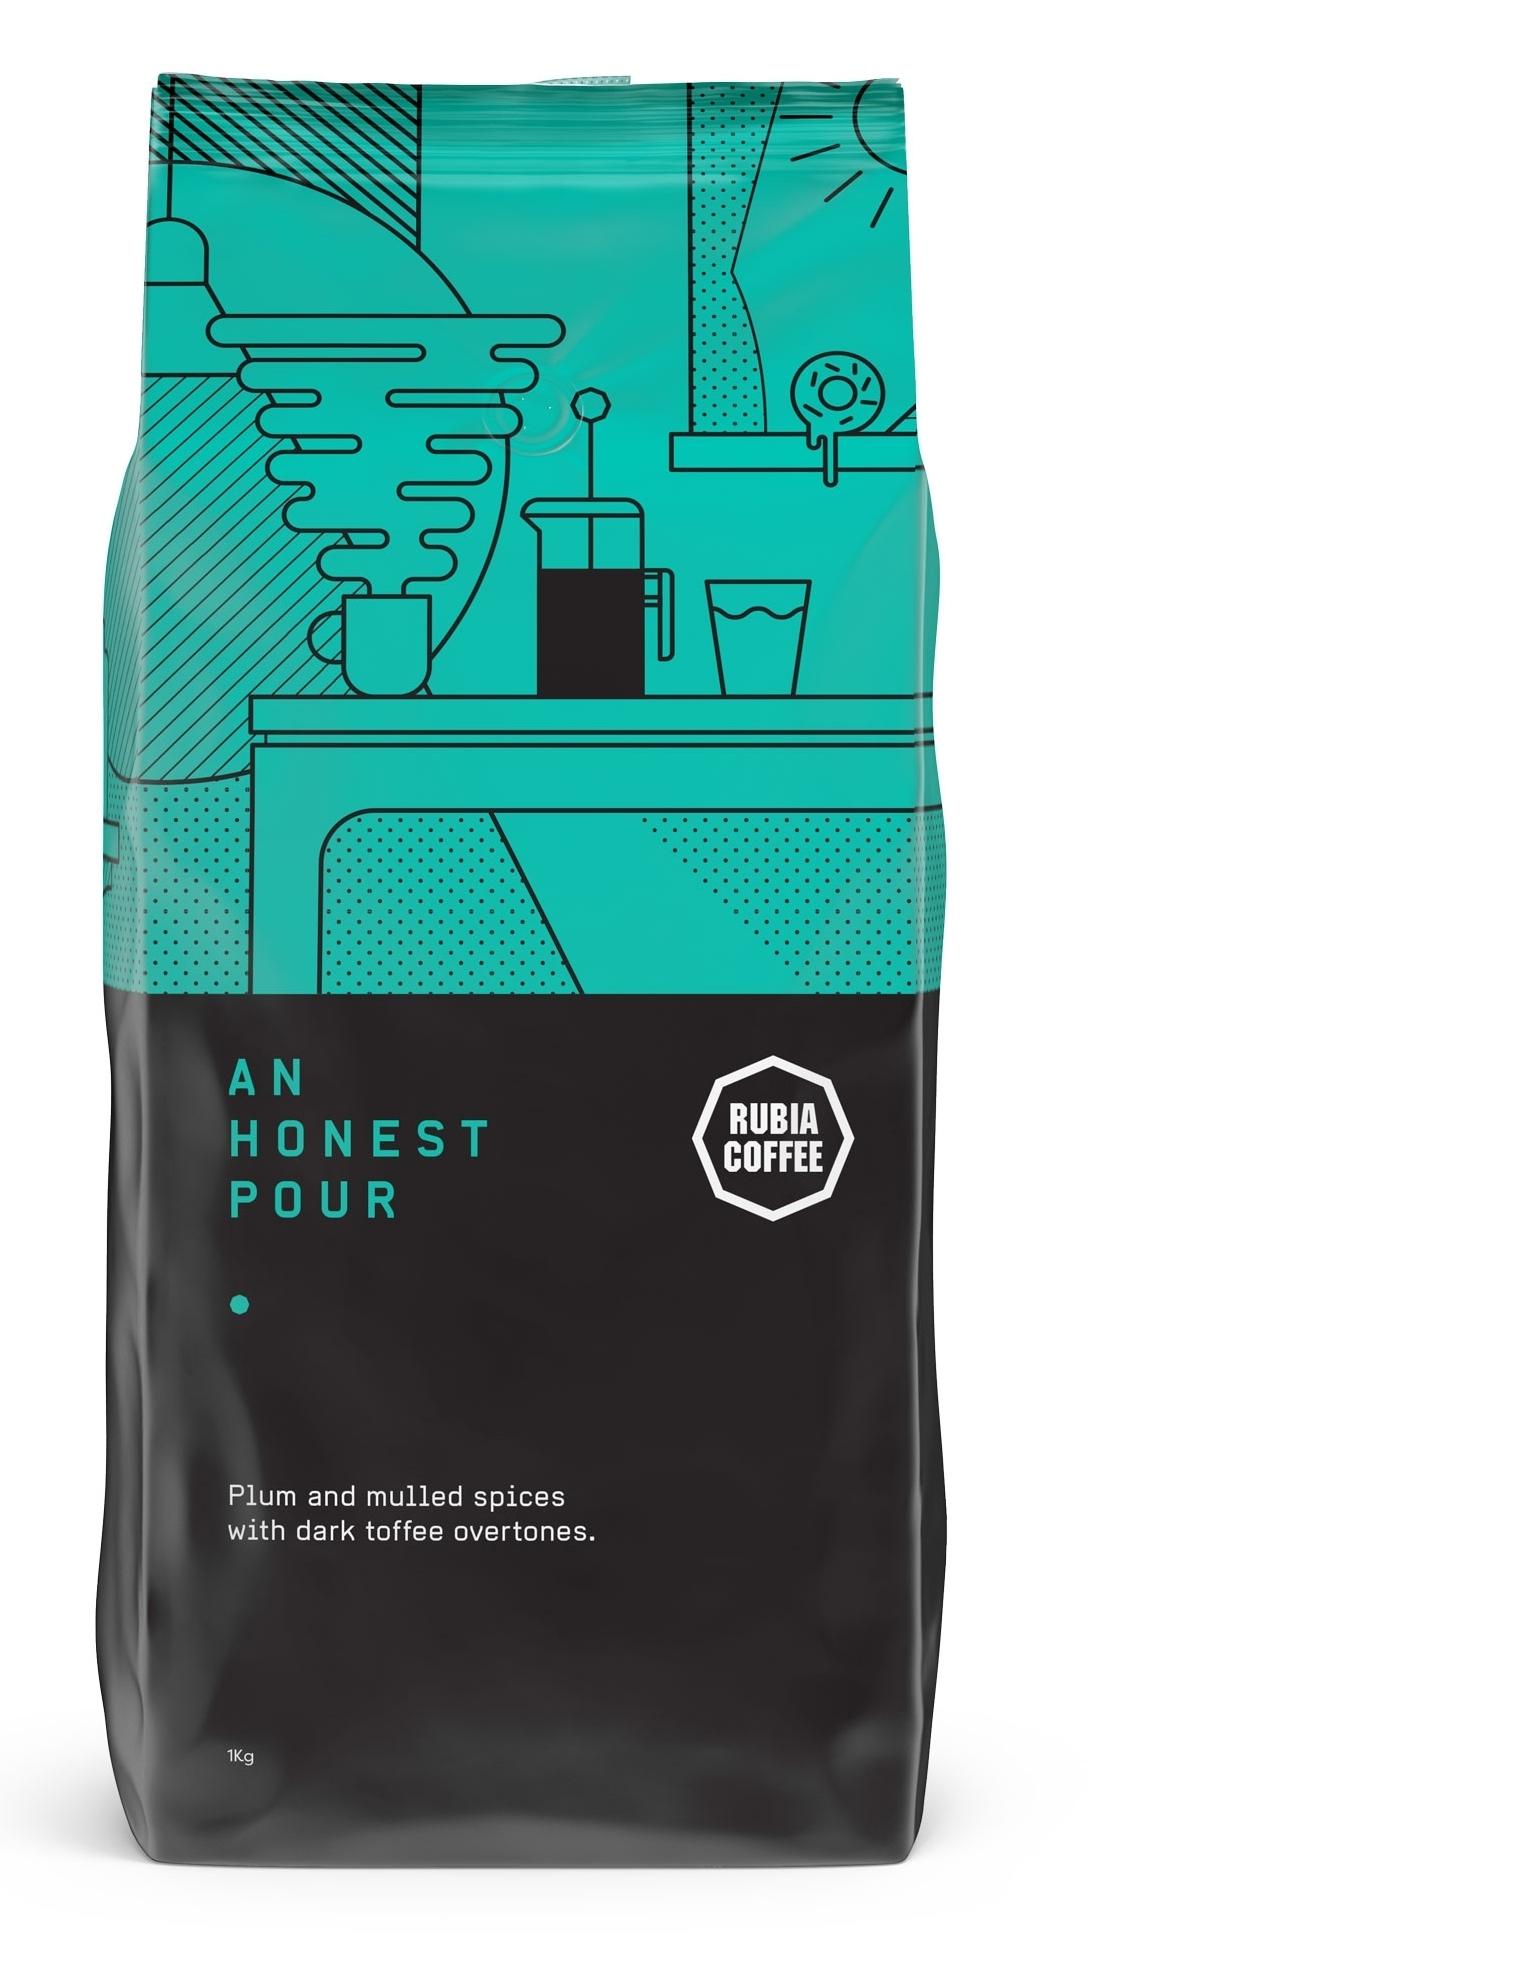 Rubia Coffe An Honest Pour coffee blend